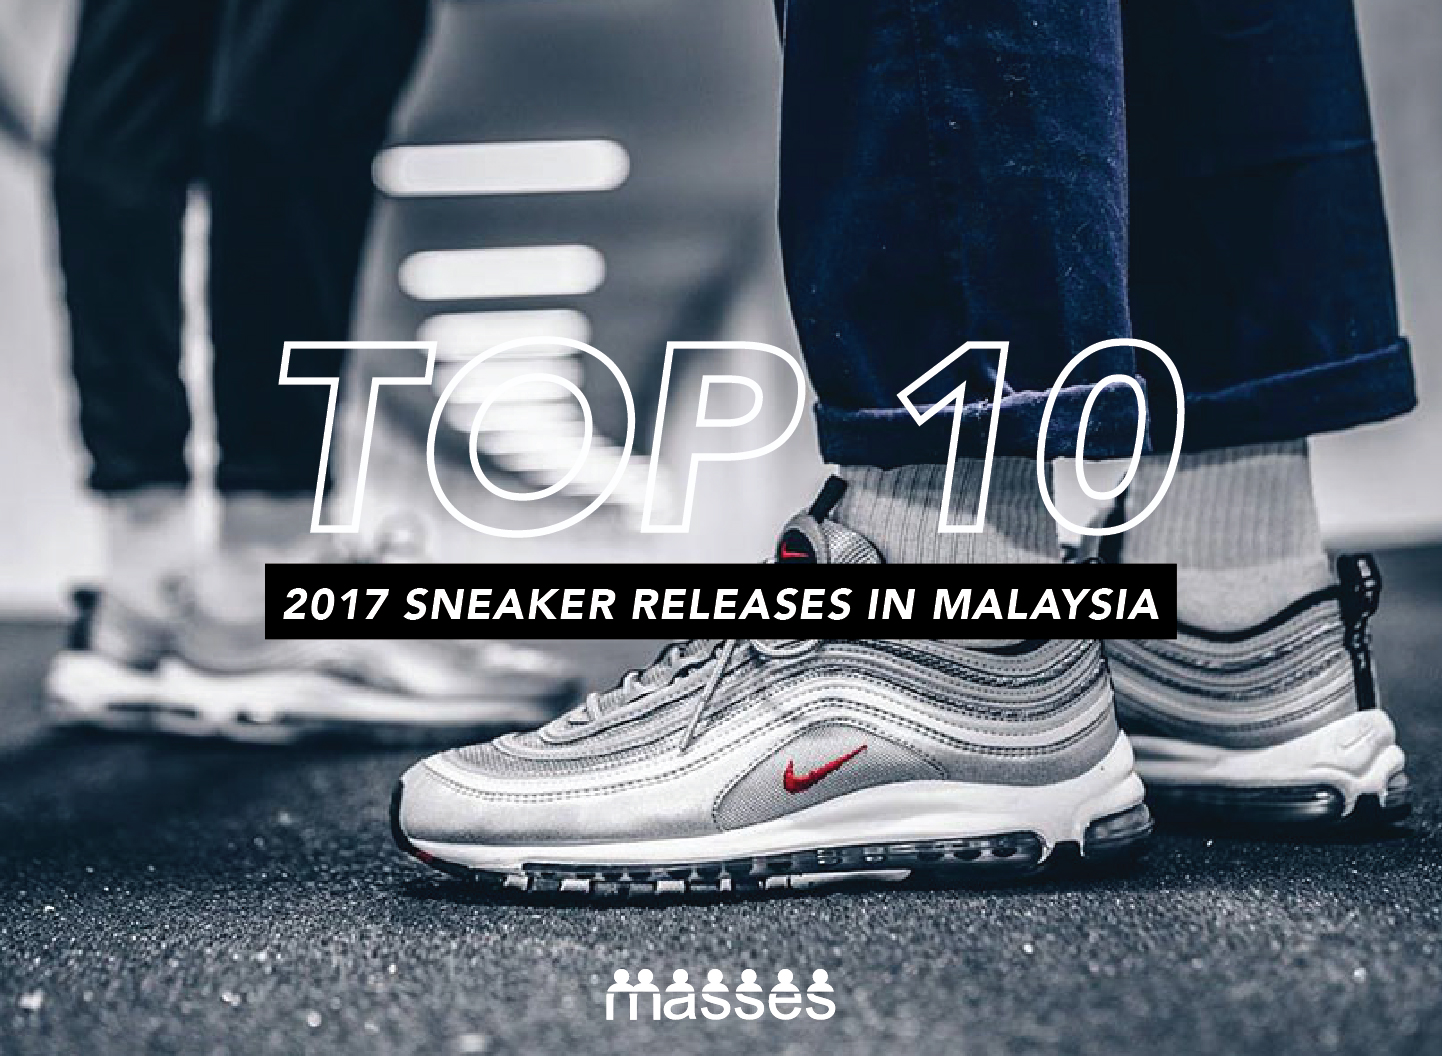 3e250dad39f Top Ten 2017 Sneaker Releases In Malaysia - MASSES